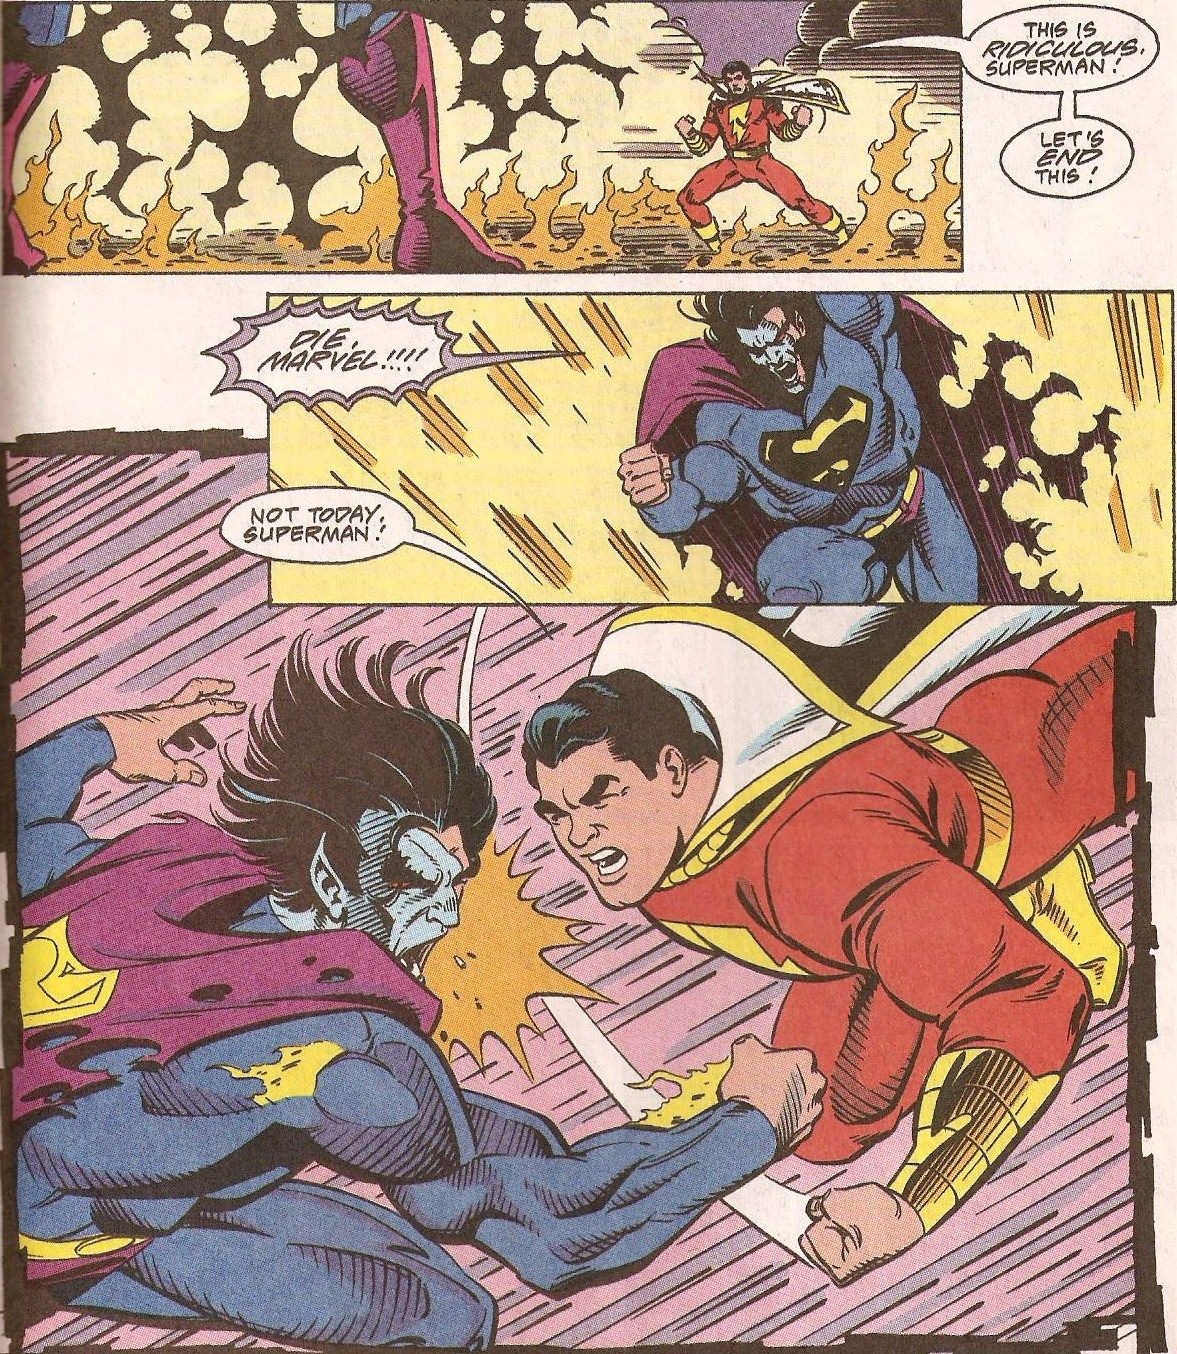 SuperMan vs. Captain Marvel | CrossOvers: HQ Legends